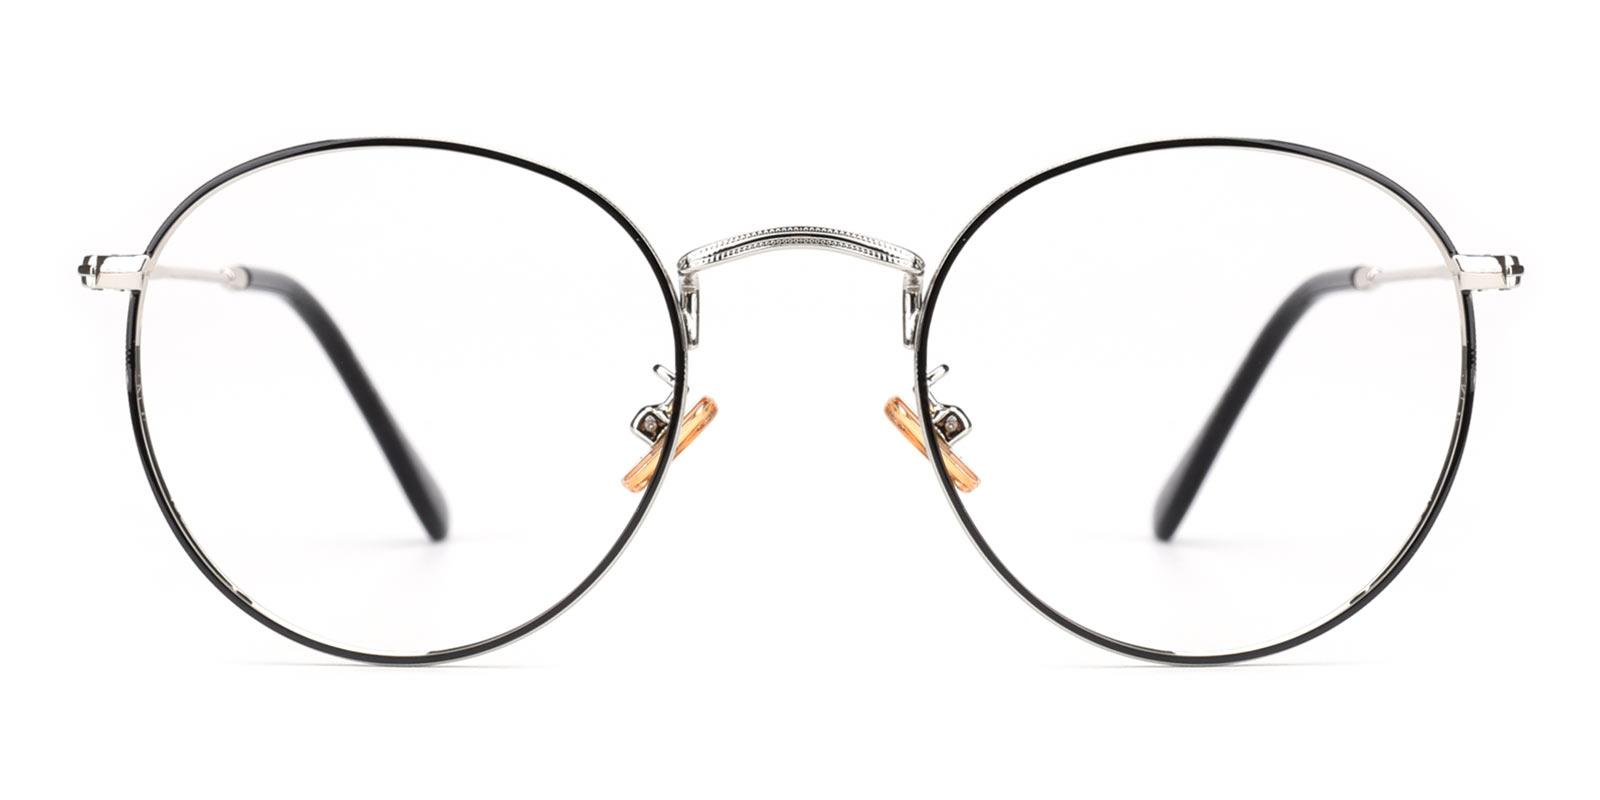 Canary-Black-Round-Metal-Eyeglasses-detail